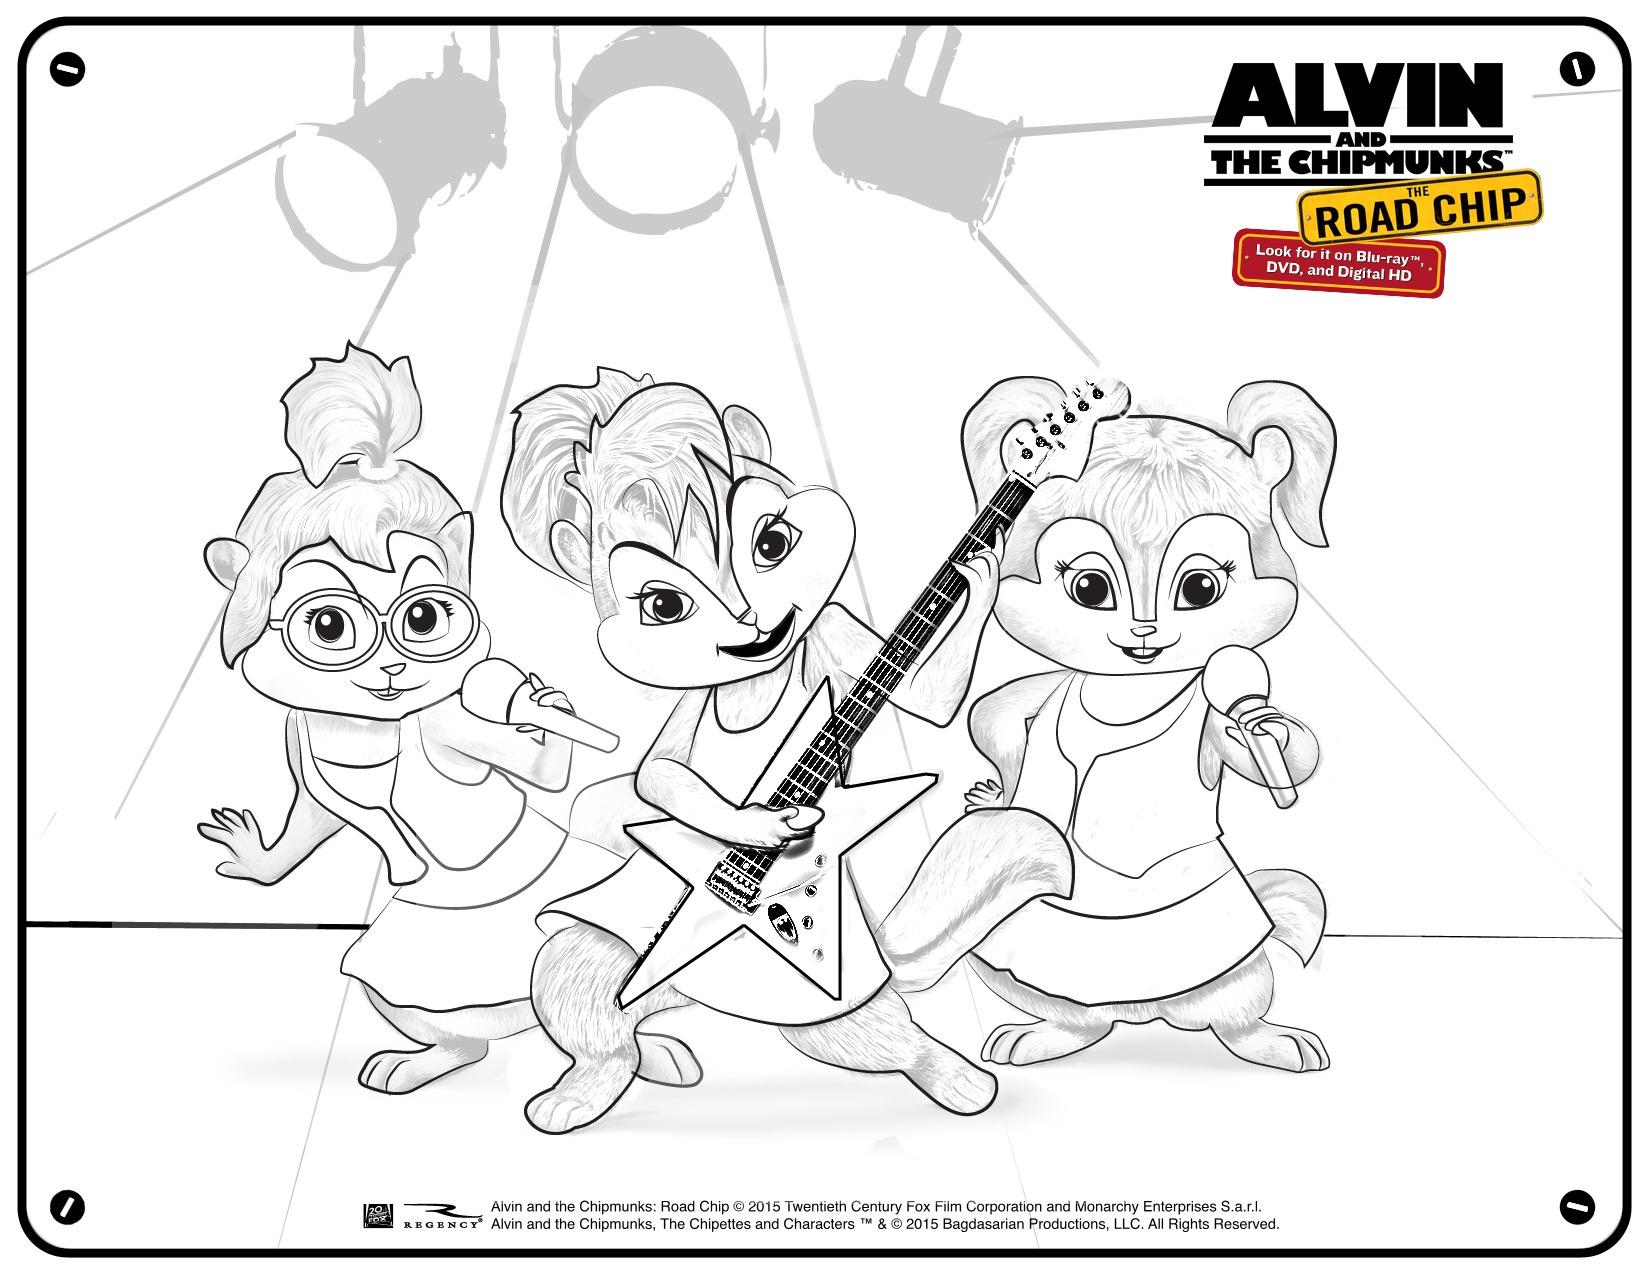 Alvin And The Chipmunks - Road Chip Partner Toolkit - Free Printable Chipmunk Mask